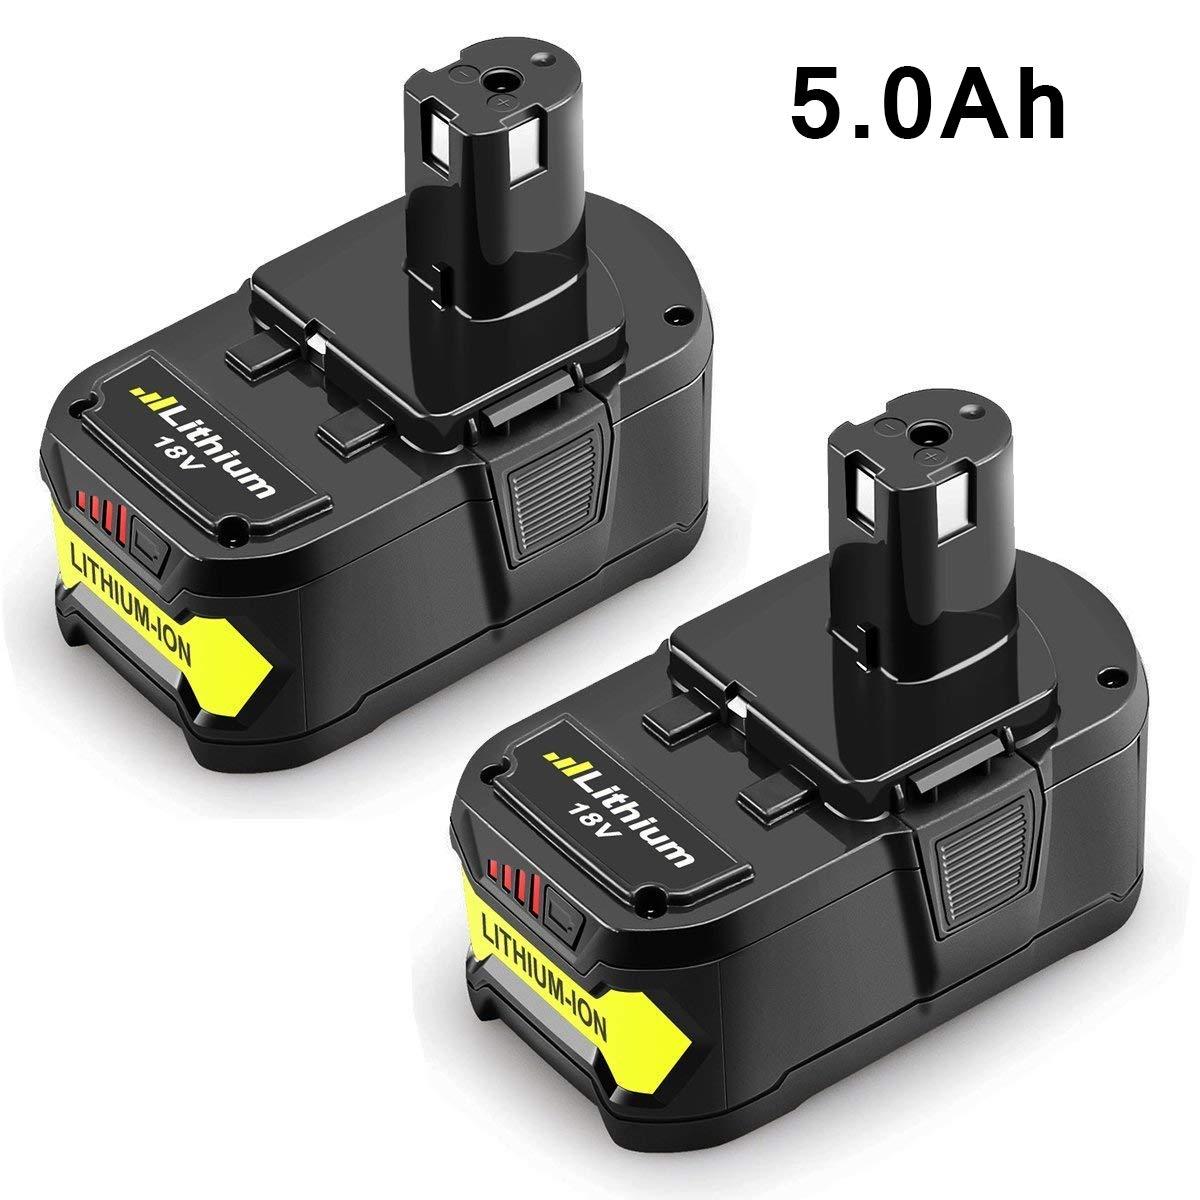 P102 5000mAh for Ryobi 18v Lithium Ion Battery P108 P103 P105 P107 P109 P104 P100 P122 Replacement for Ryobi 18 volt 5.0Ah One+ Plus Cordless Tools-2Packs